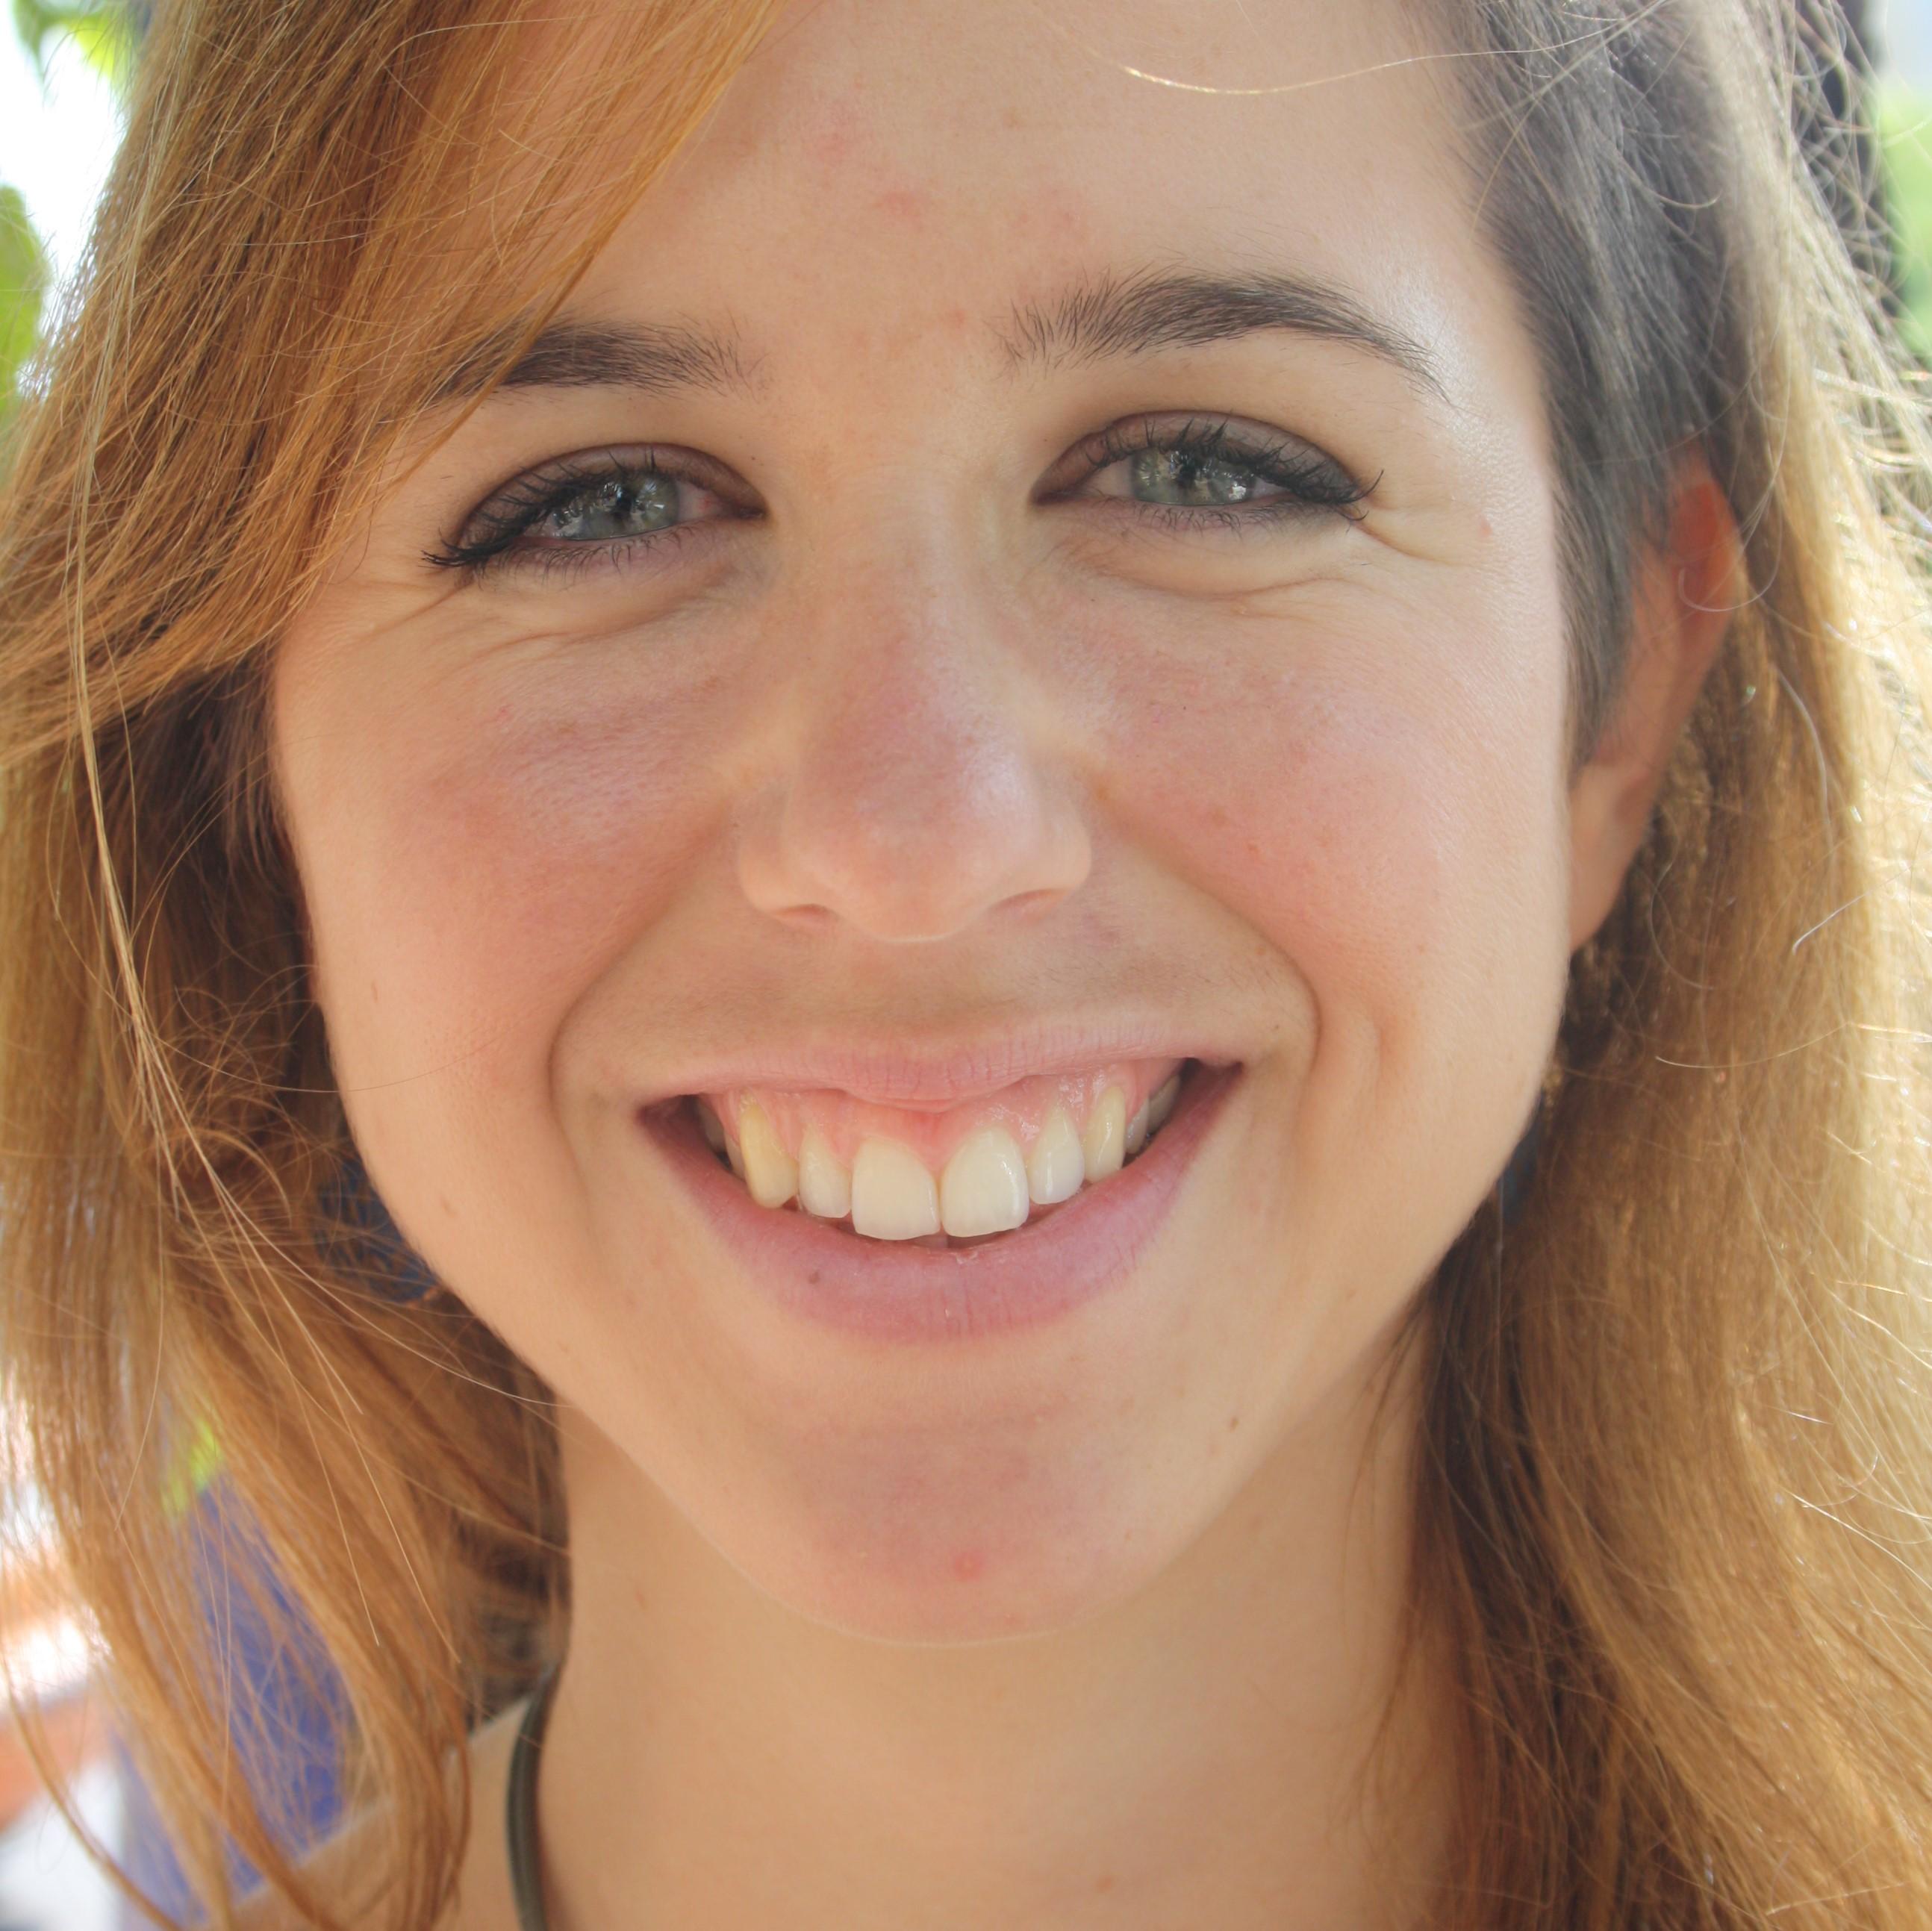 Tamara Villaverde